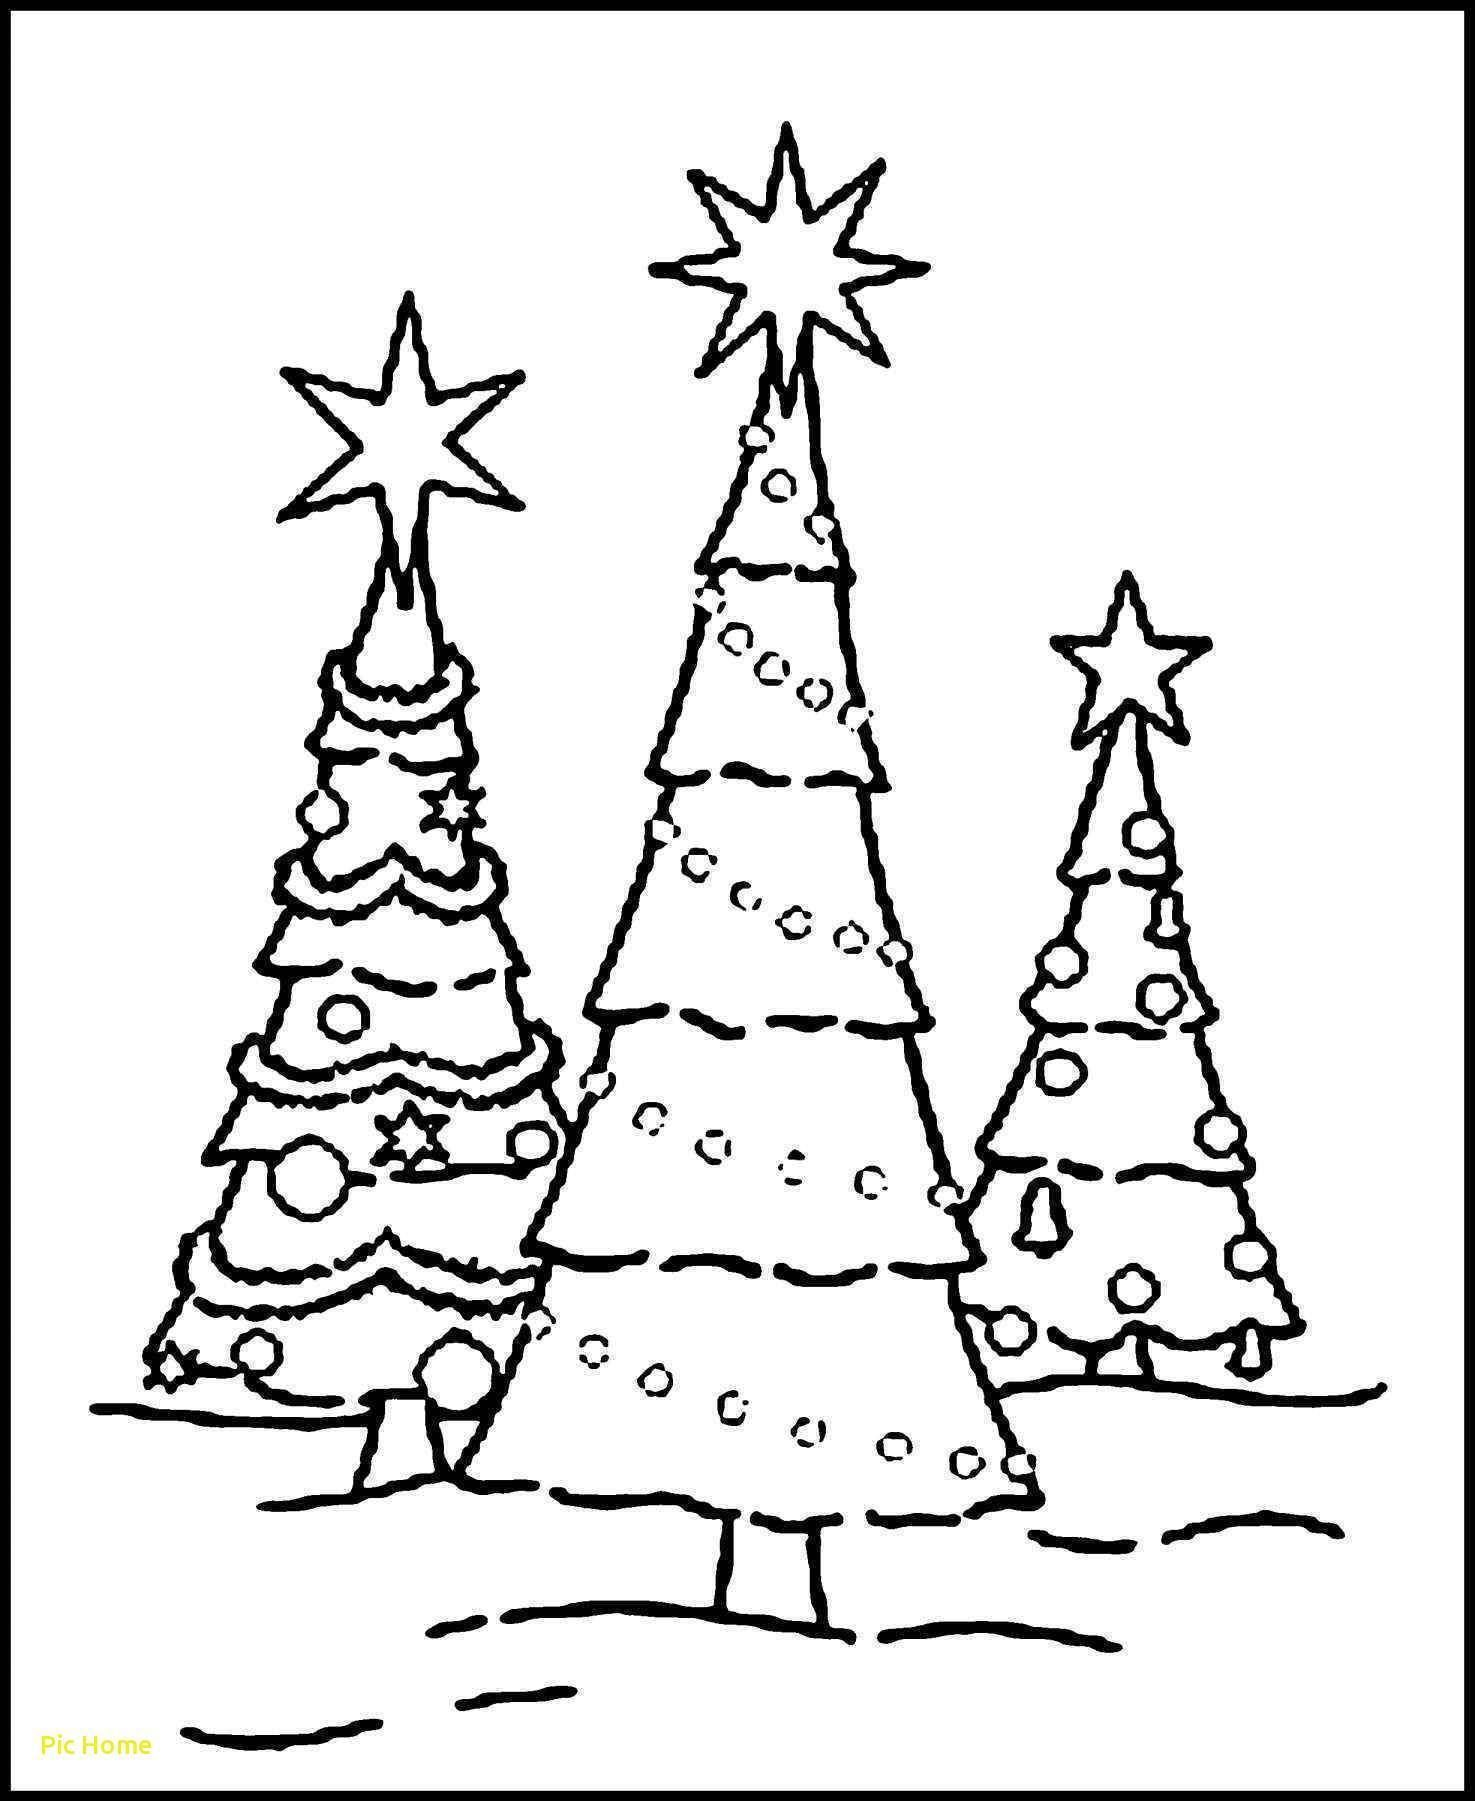 Inspirational Moving Christmas Yard Decorations Homedecoration Homedecorations Homedecorationideas Homedecorationtre Halaman Mewarnai Ornamen Pohon Natal